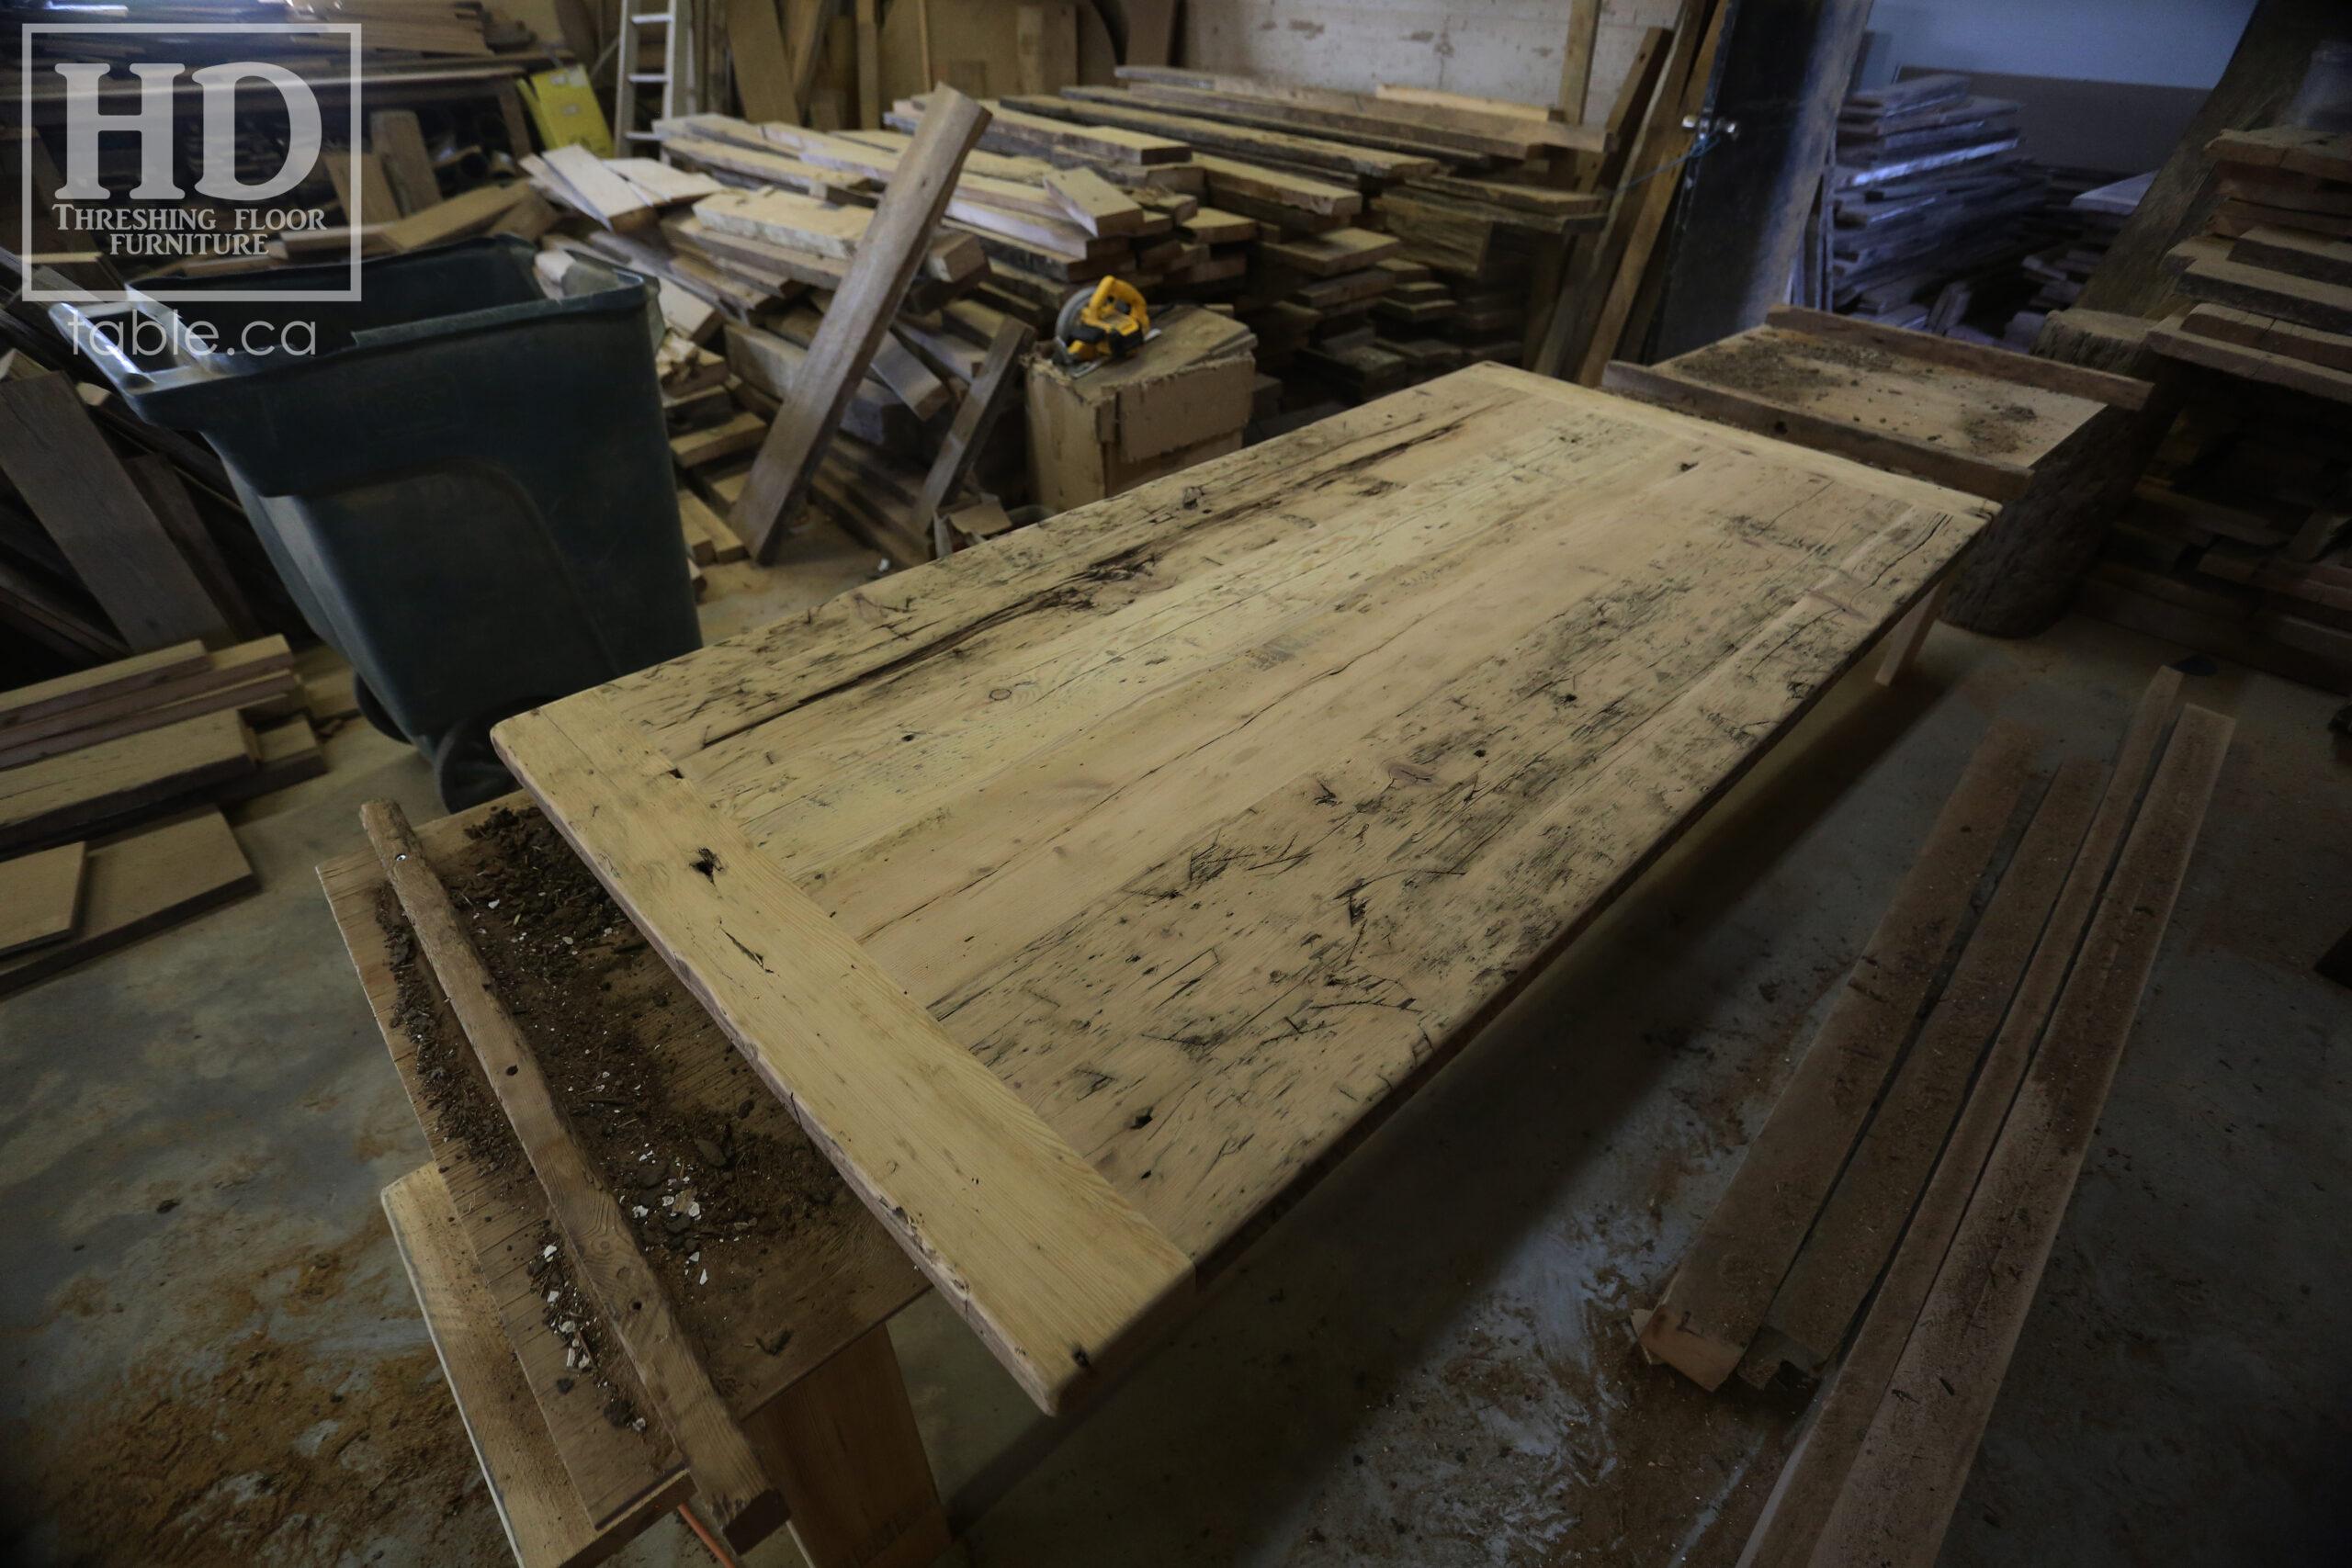 "Custom Reclaimed Wood Table Tops - Hemlock Barnwood Threshing Floor 2"" thick Construction - Original edges & distressing kept - Premium clearcoat epoxy + satin polyurethane finish - www.table.ca"